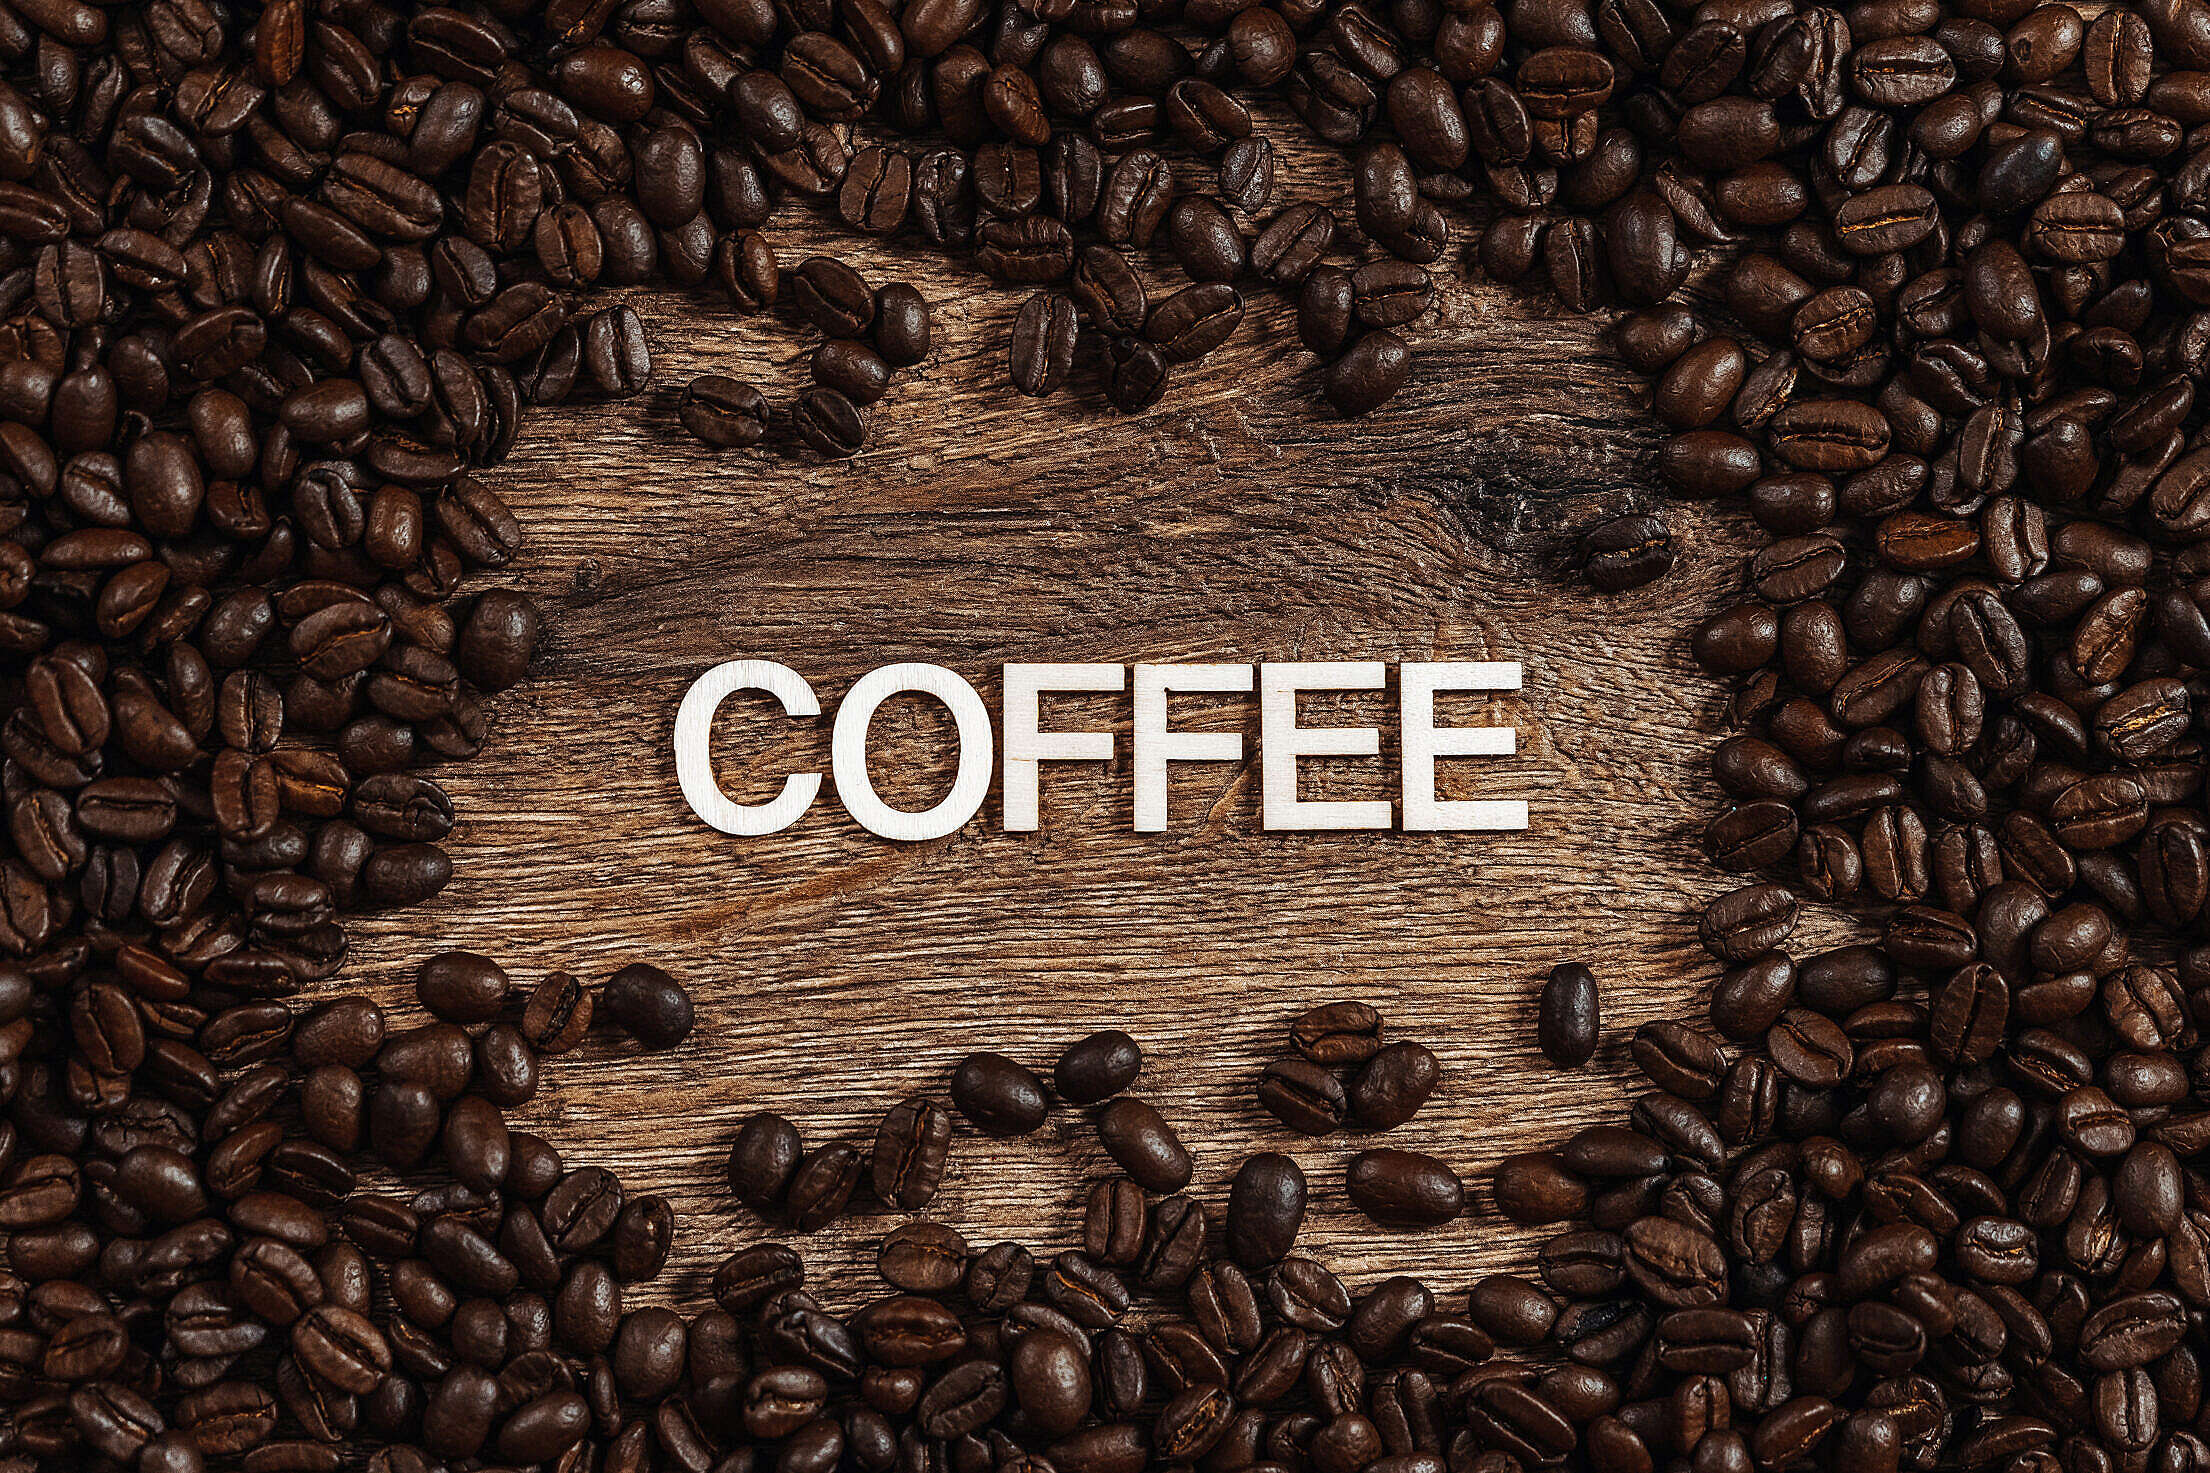 Coffee Typography Free Stock Photo